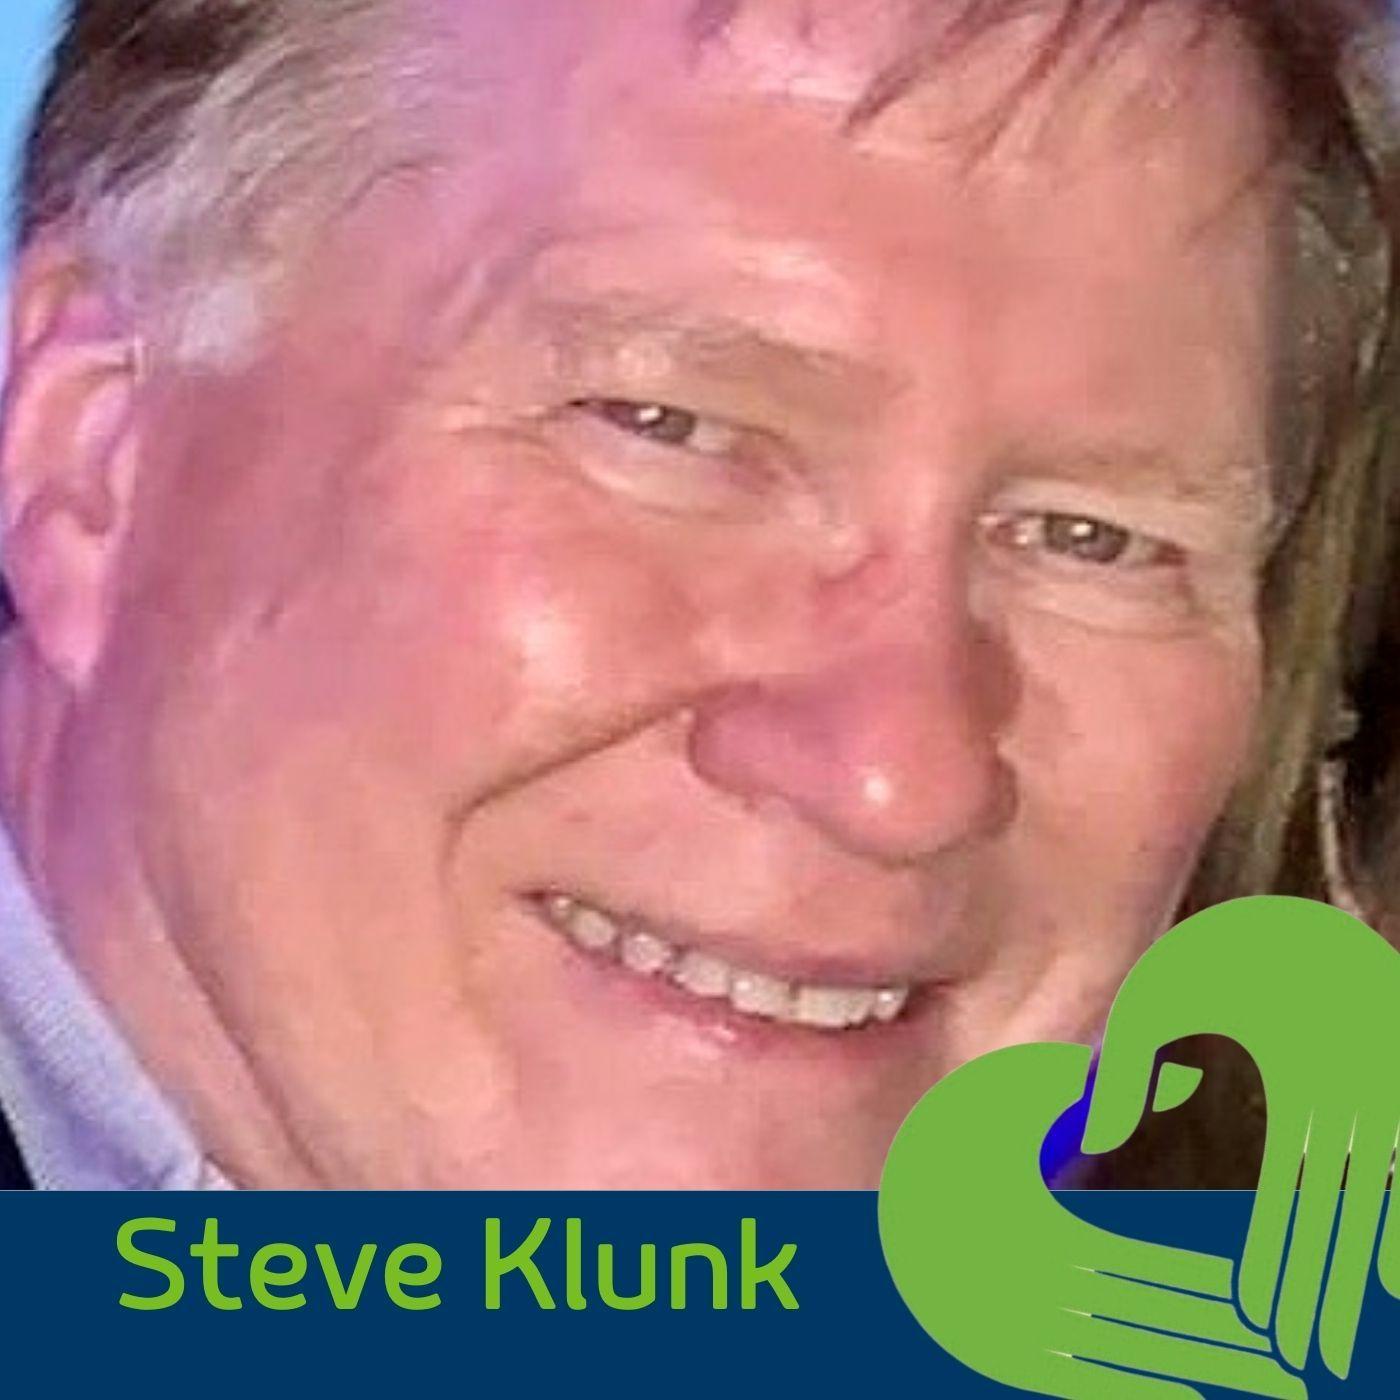 Steve Klunk